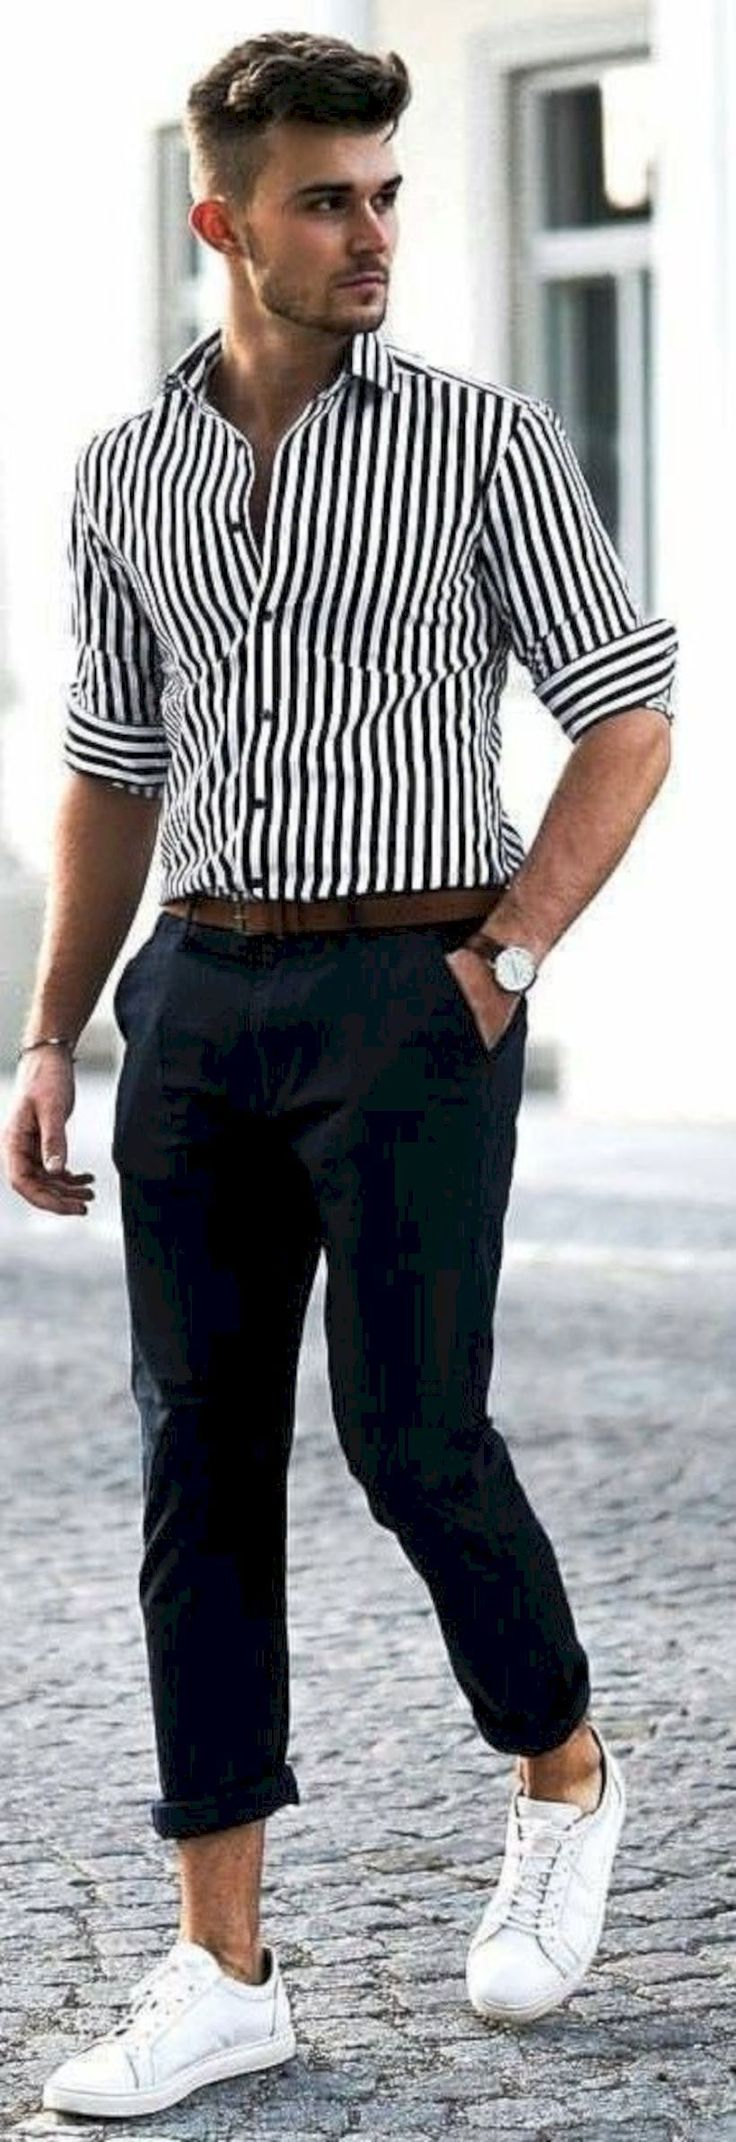 Cool 38 Fashion Street Fashion Ideas for Men #CasualClothingForMen